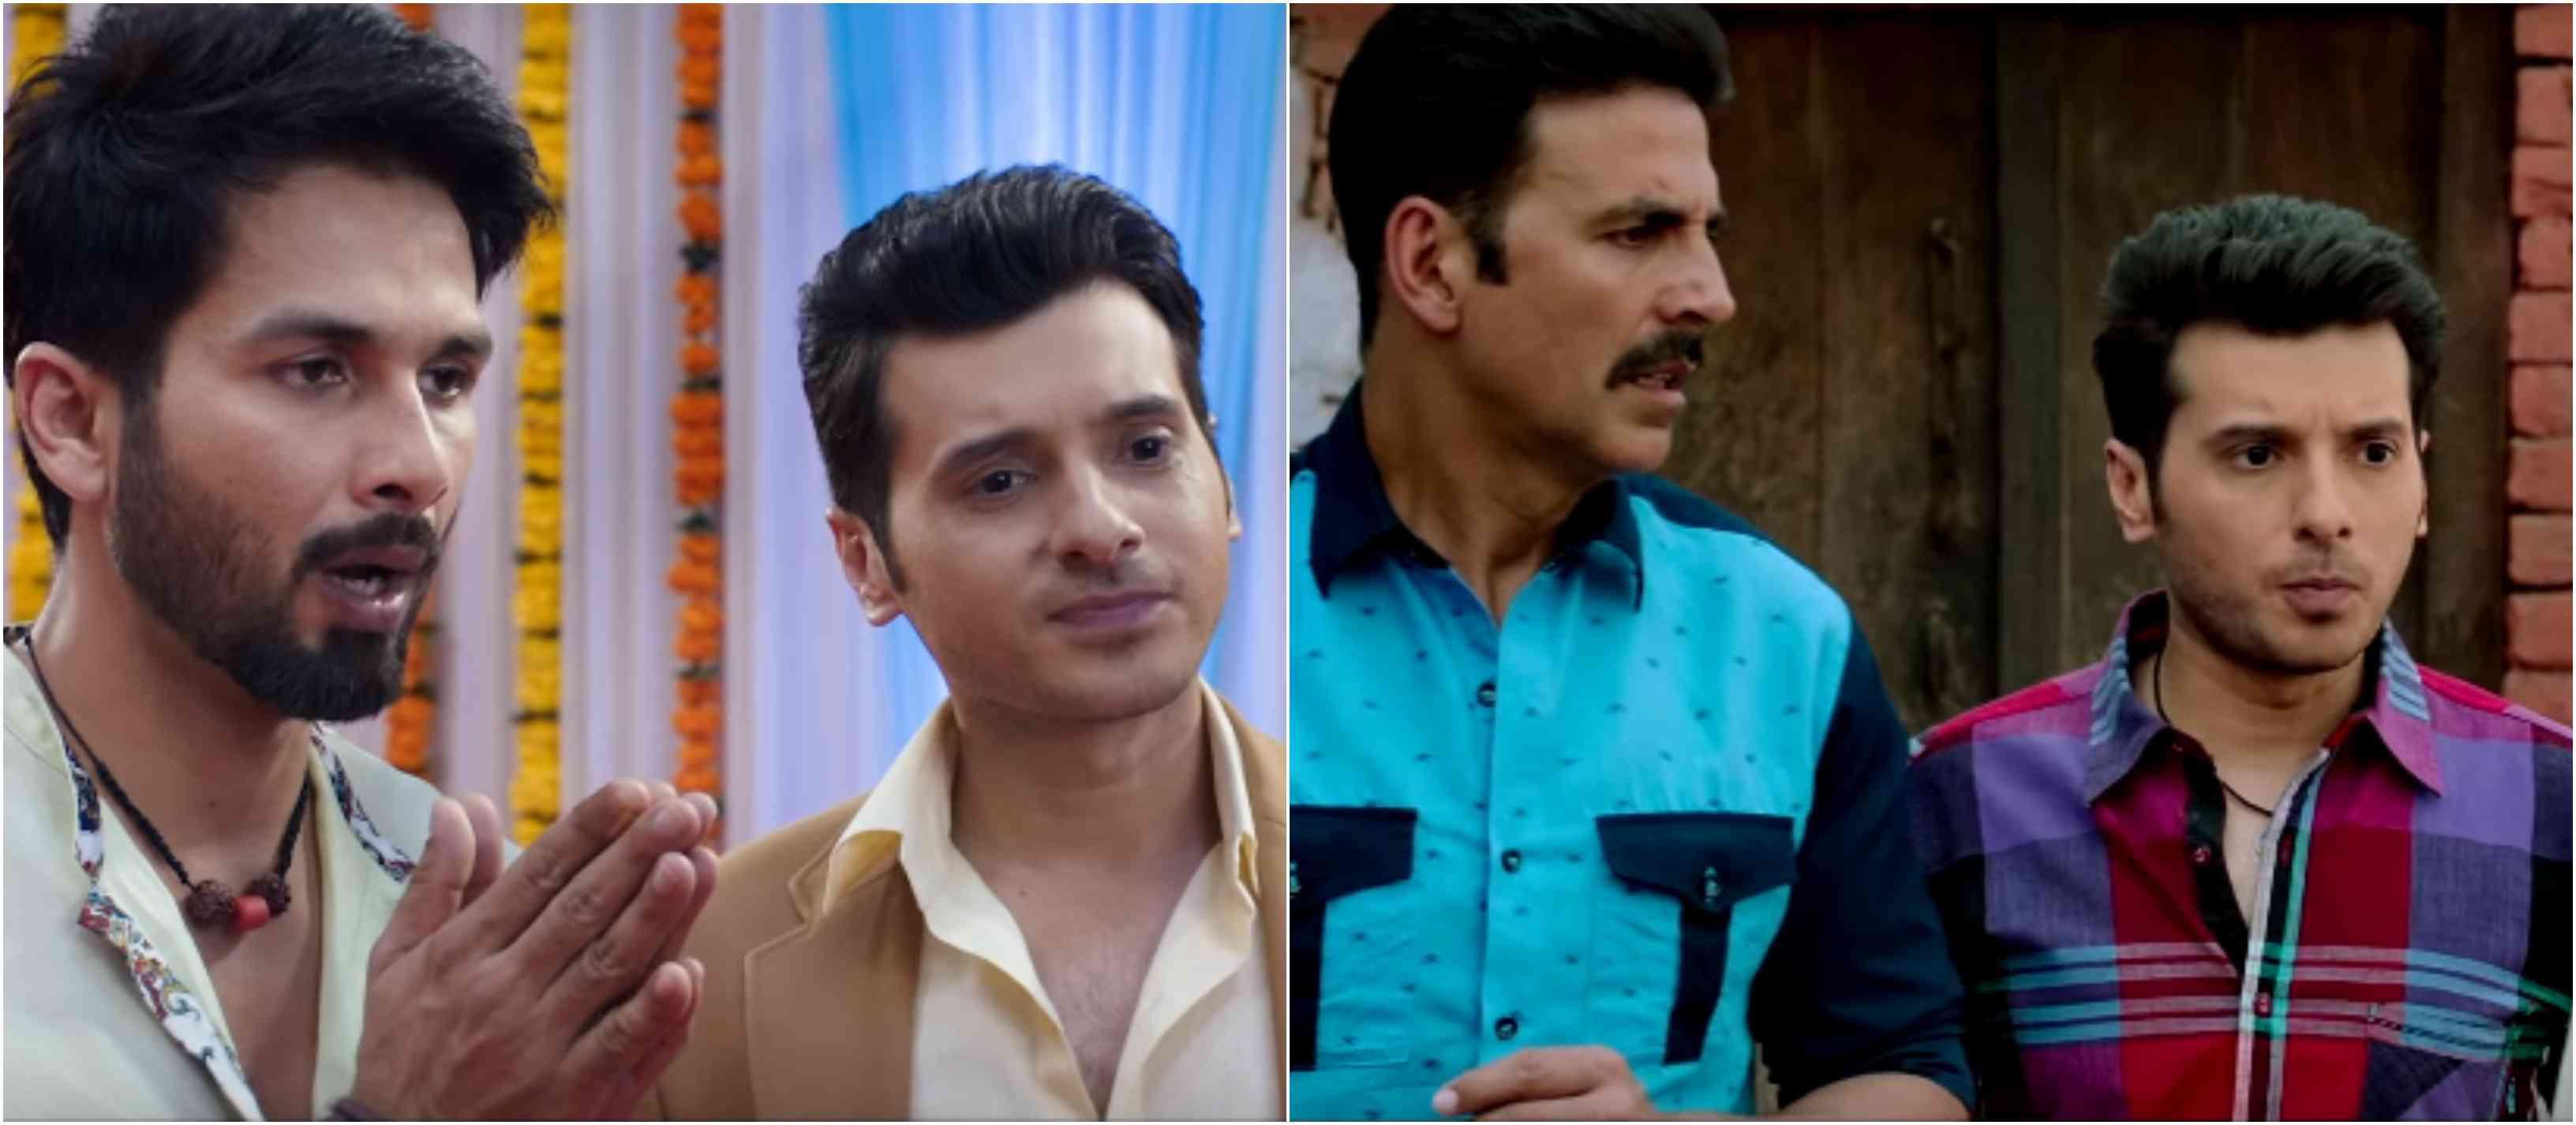 Divyenndu in Batti Gul Meter Chalu (left) and Toilet: Ek Prem Katha. Courtesy Viacom18 Motion Pictures/T-Series Films.